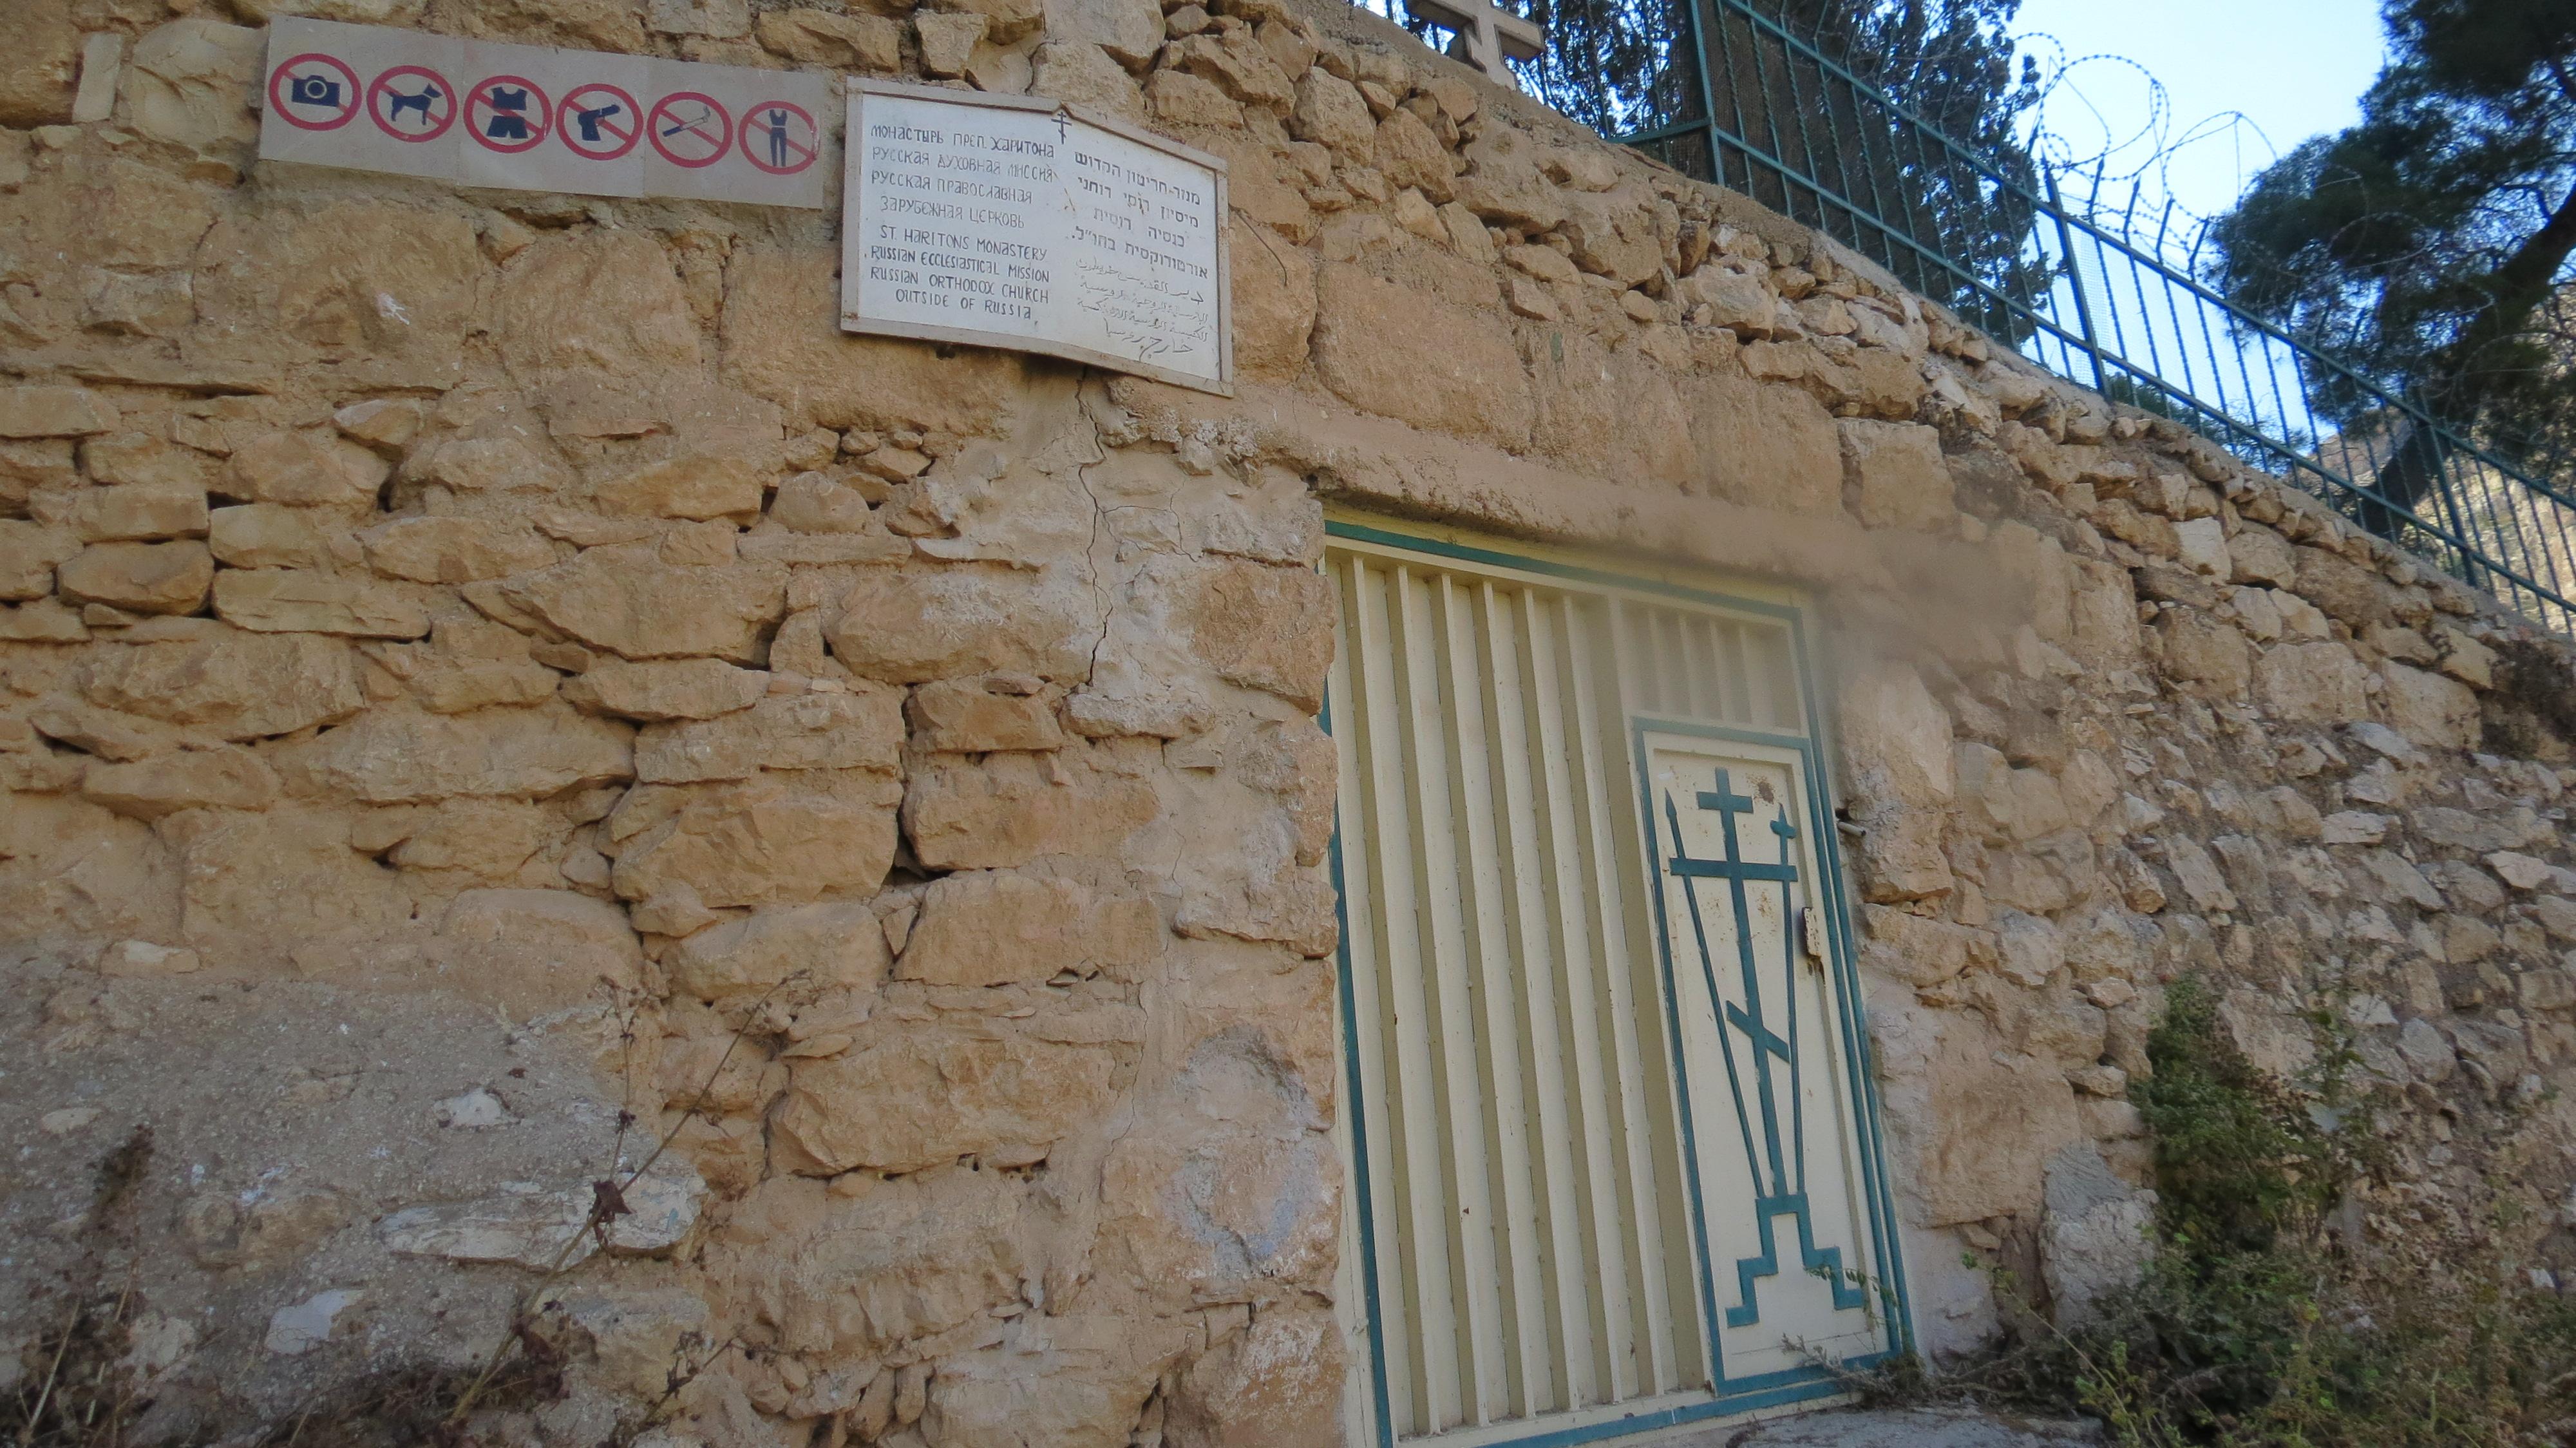 Paran Monastery and Nahal Prat Nature Reserve